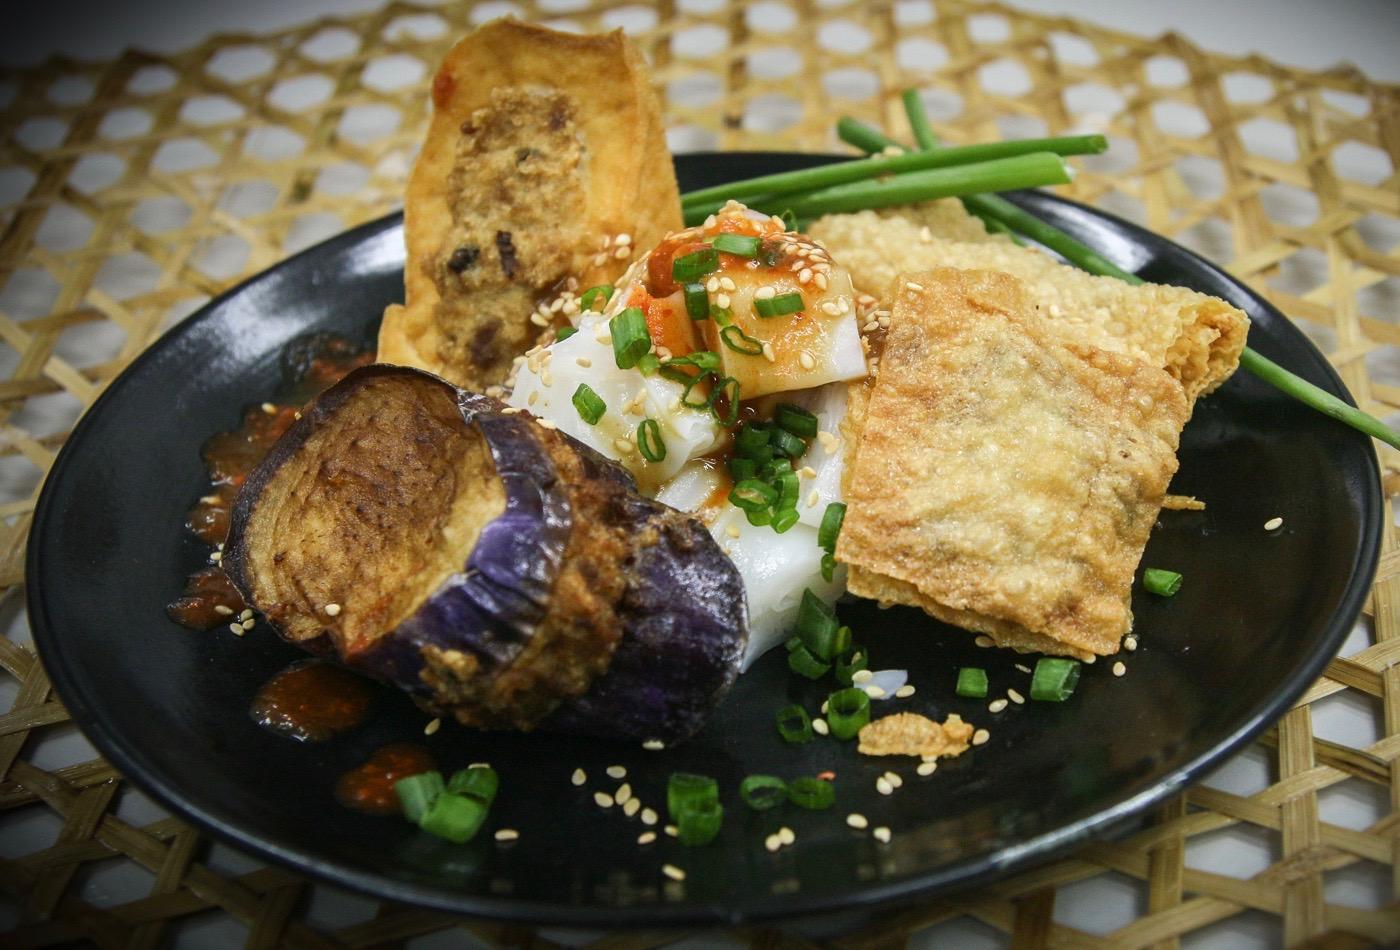 Stuffed Bean Curd or Tofu Skin the Hakka Yong Tofu way